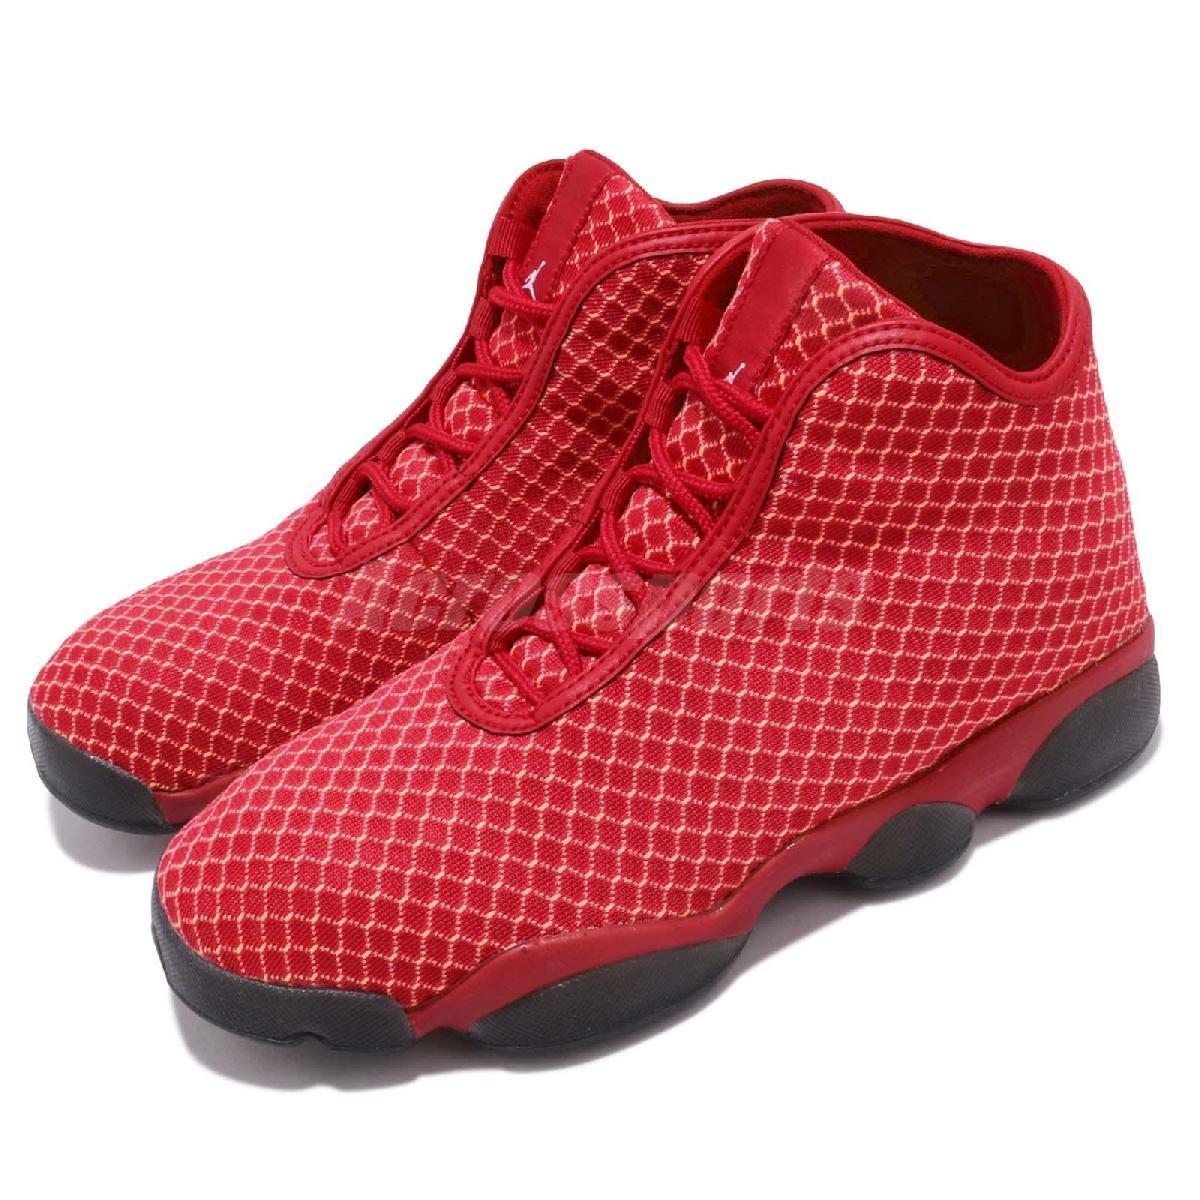 Nike籃球鞋Jordan Horizon BG紅黑喬丹飛人女鞋大童鞋PUMP306 823583-600